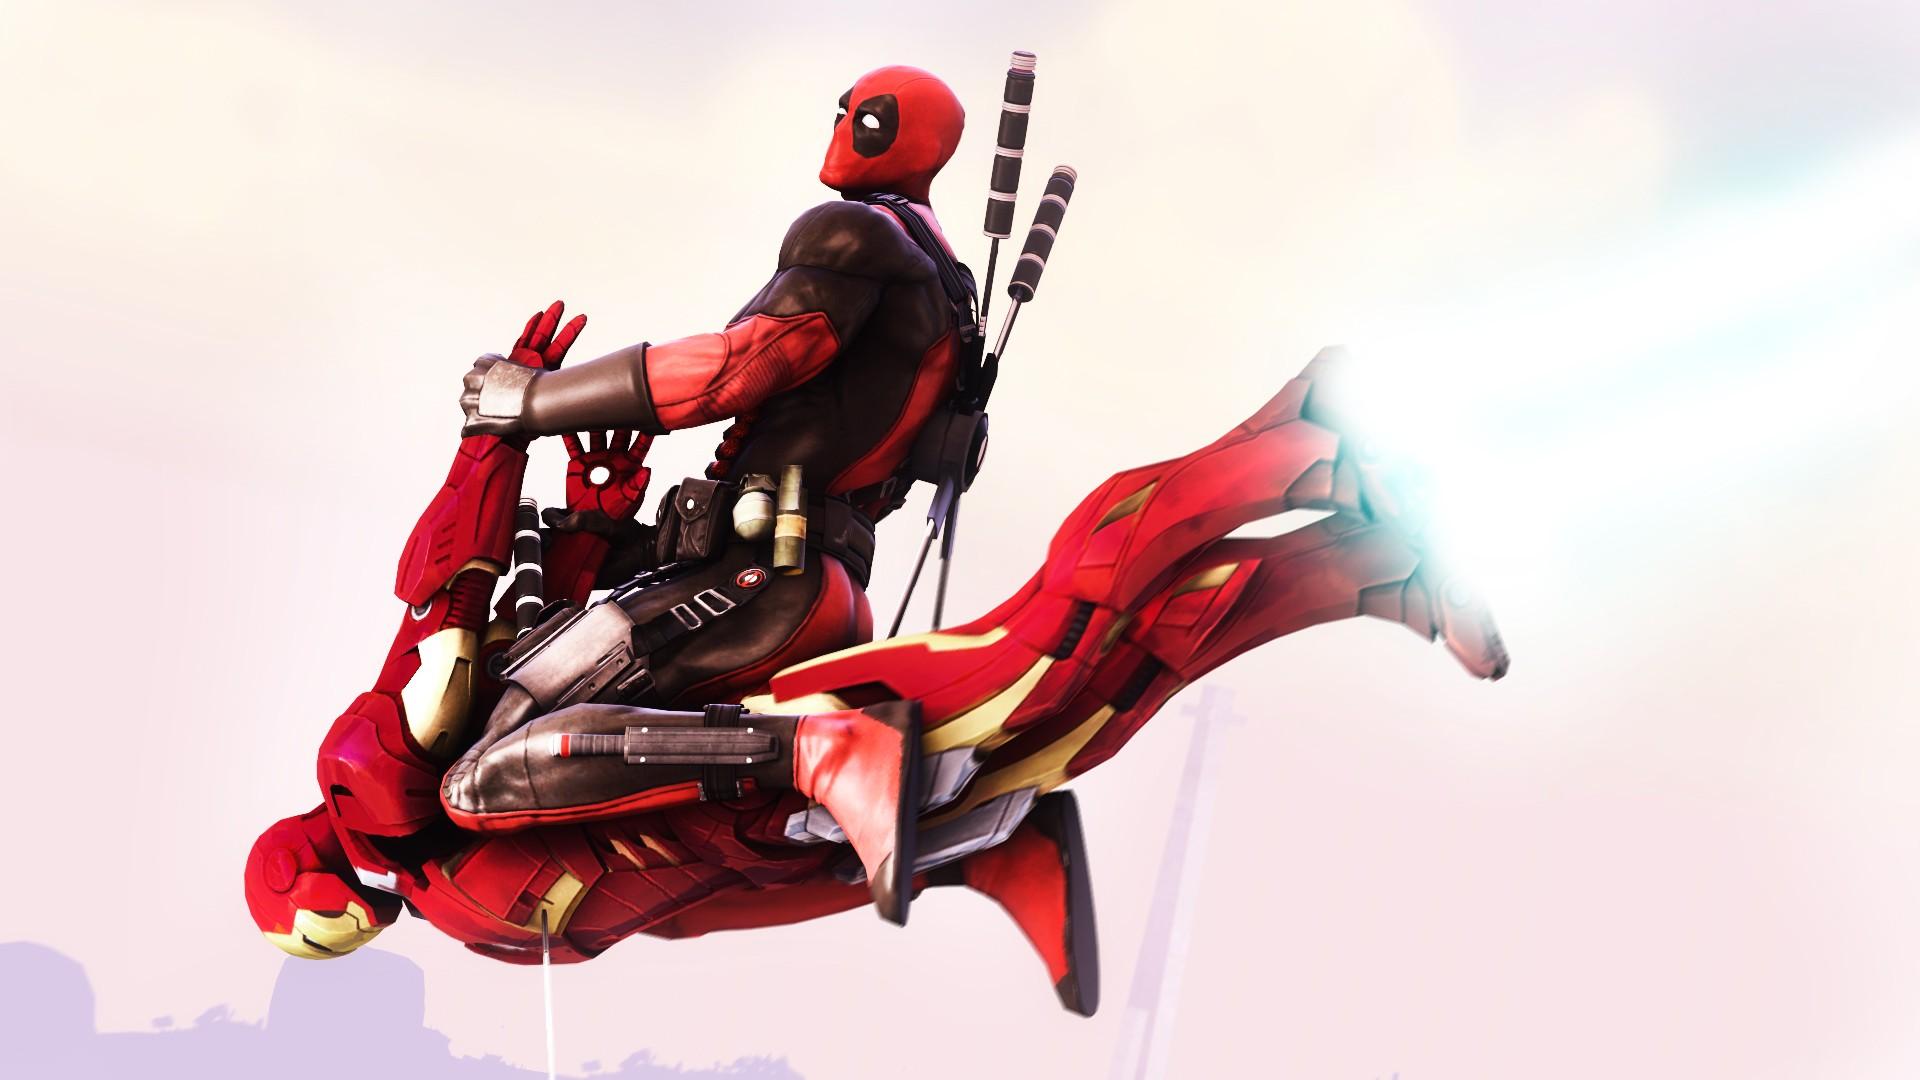 Deadpool rides Ironman